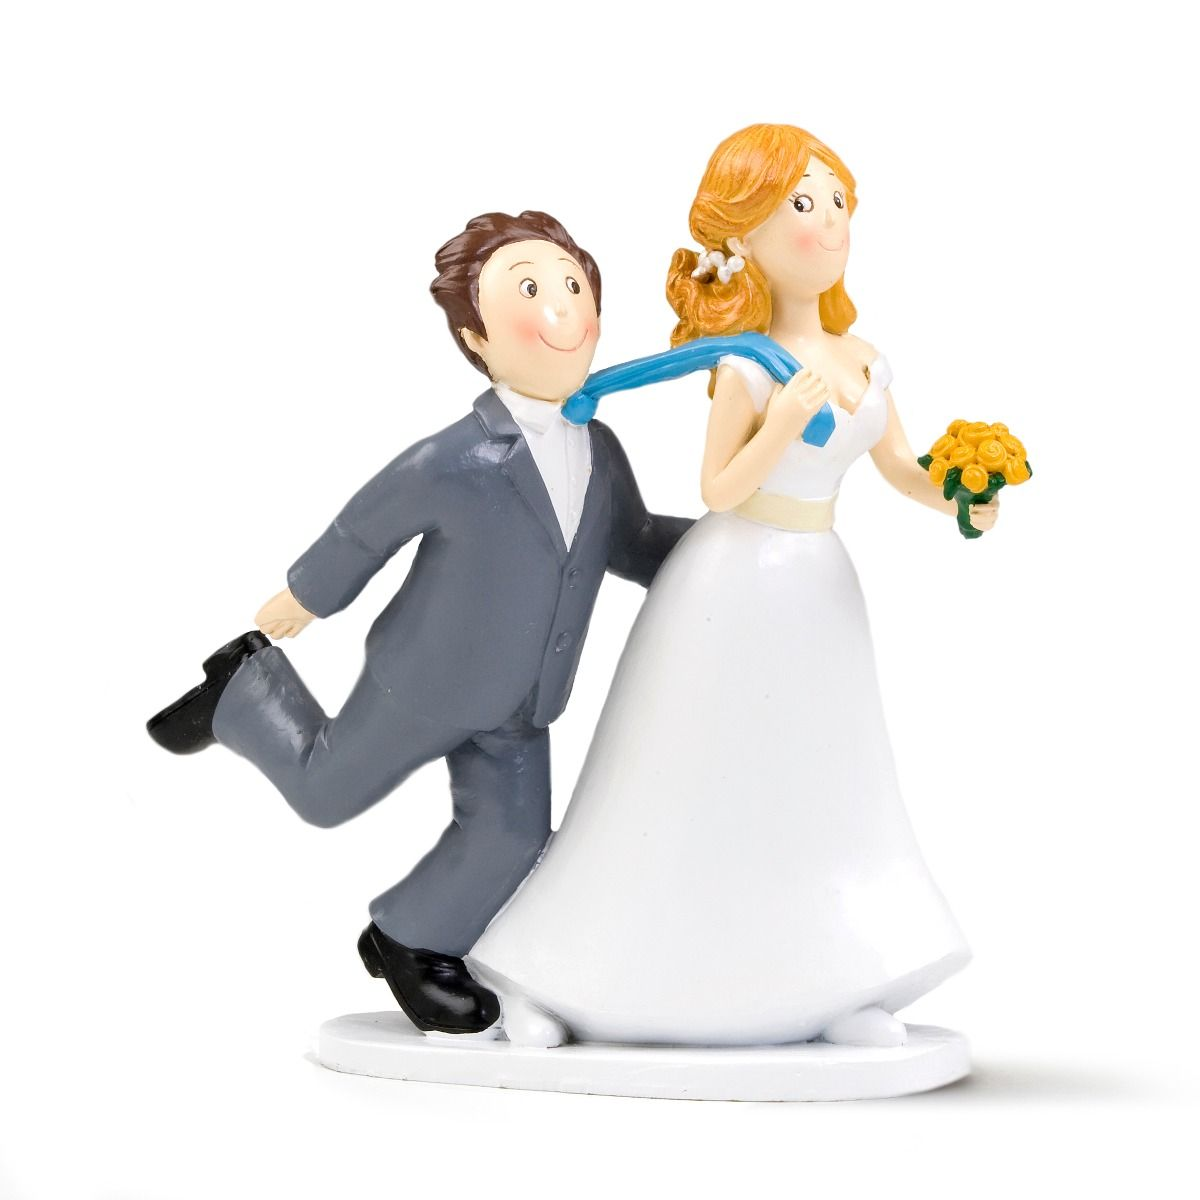 Figurine de gâteaux de mariage tirant la cravate